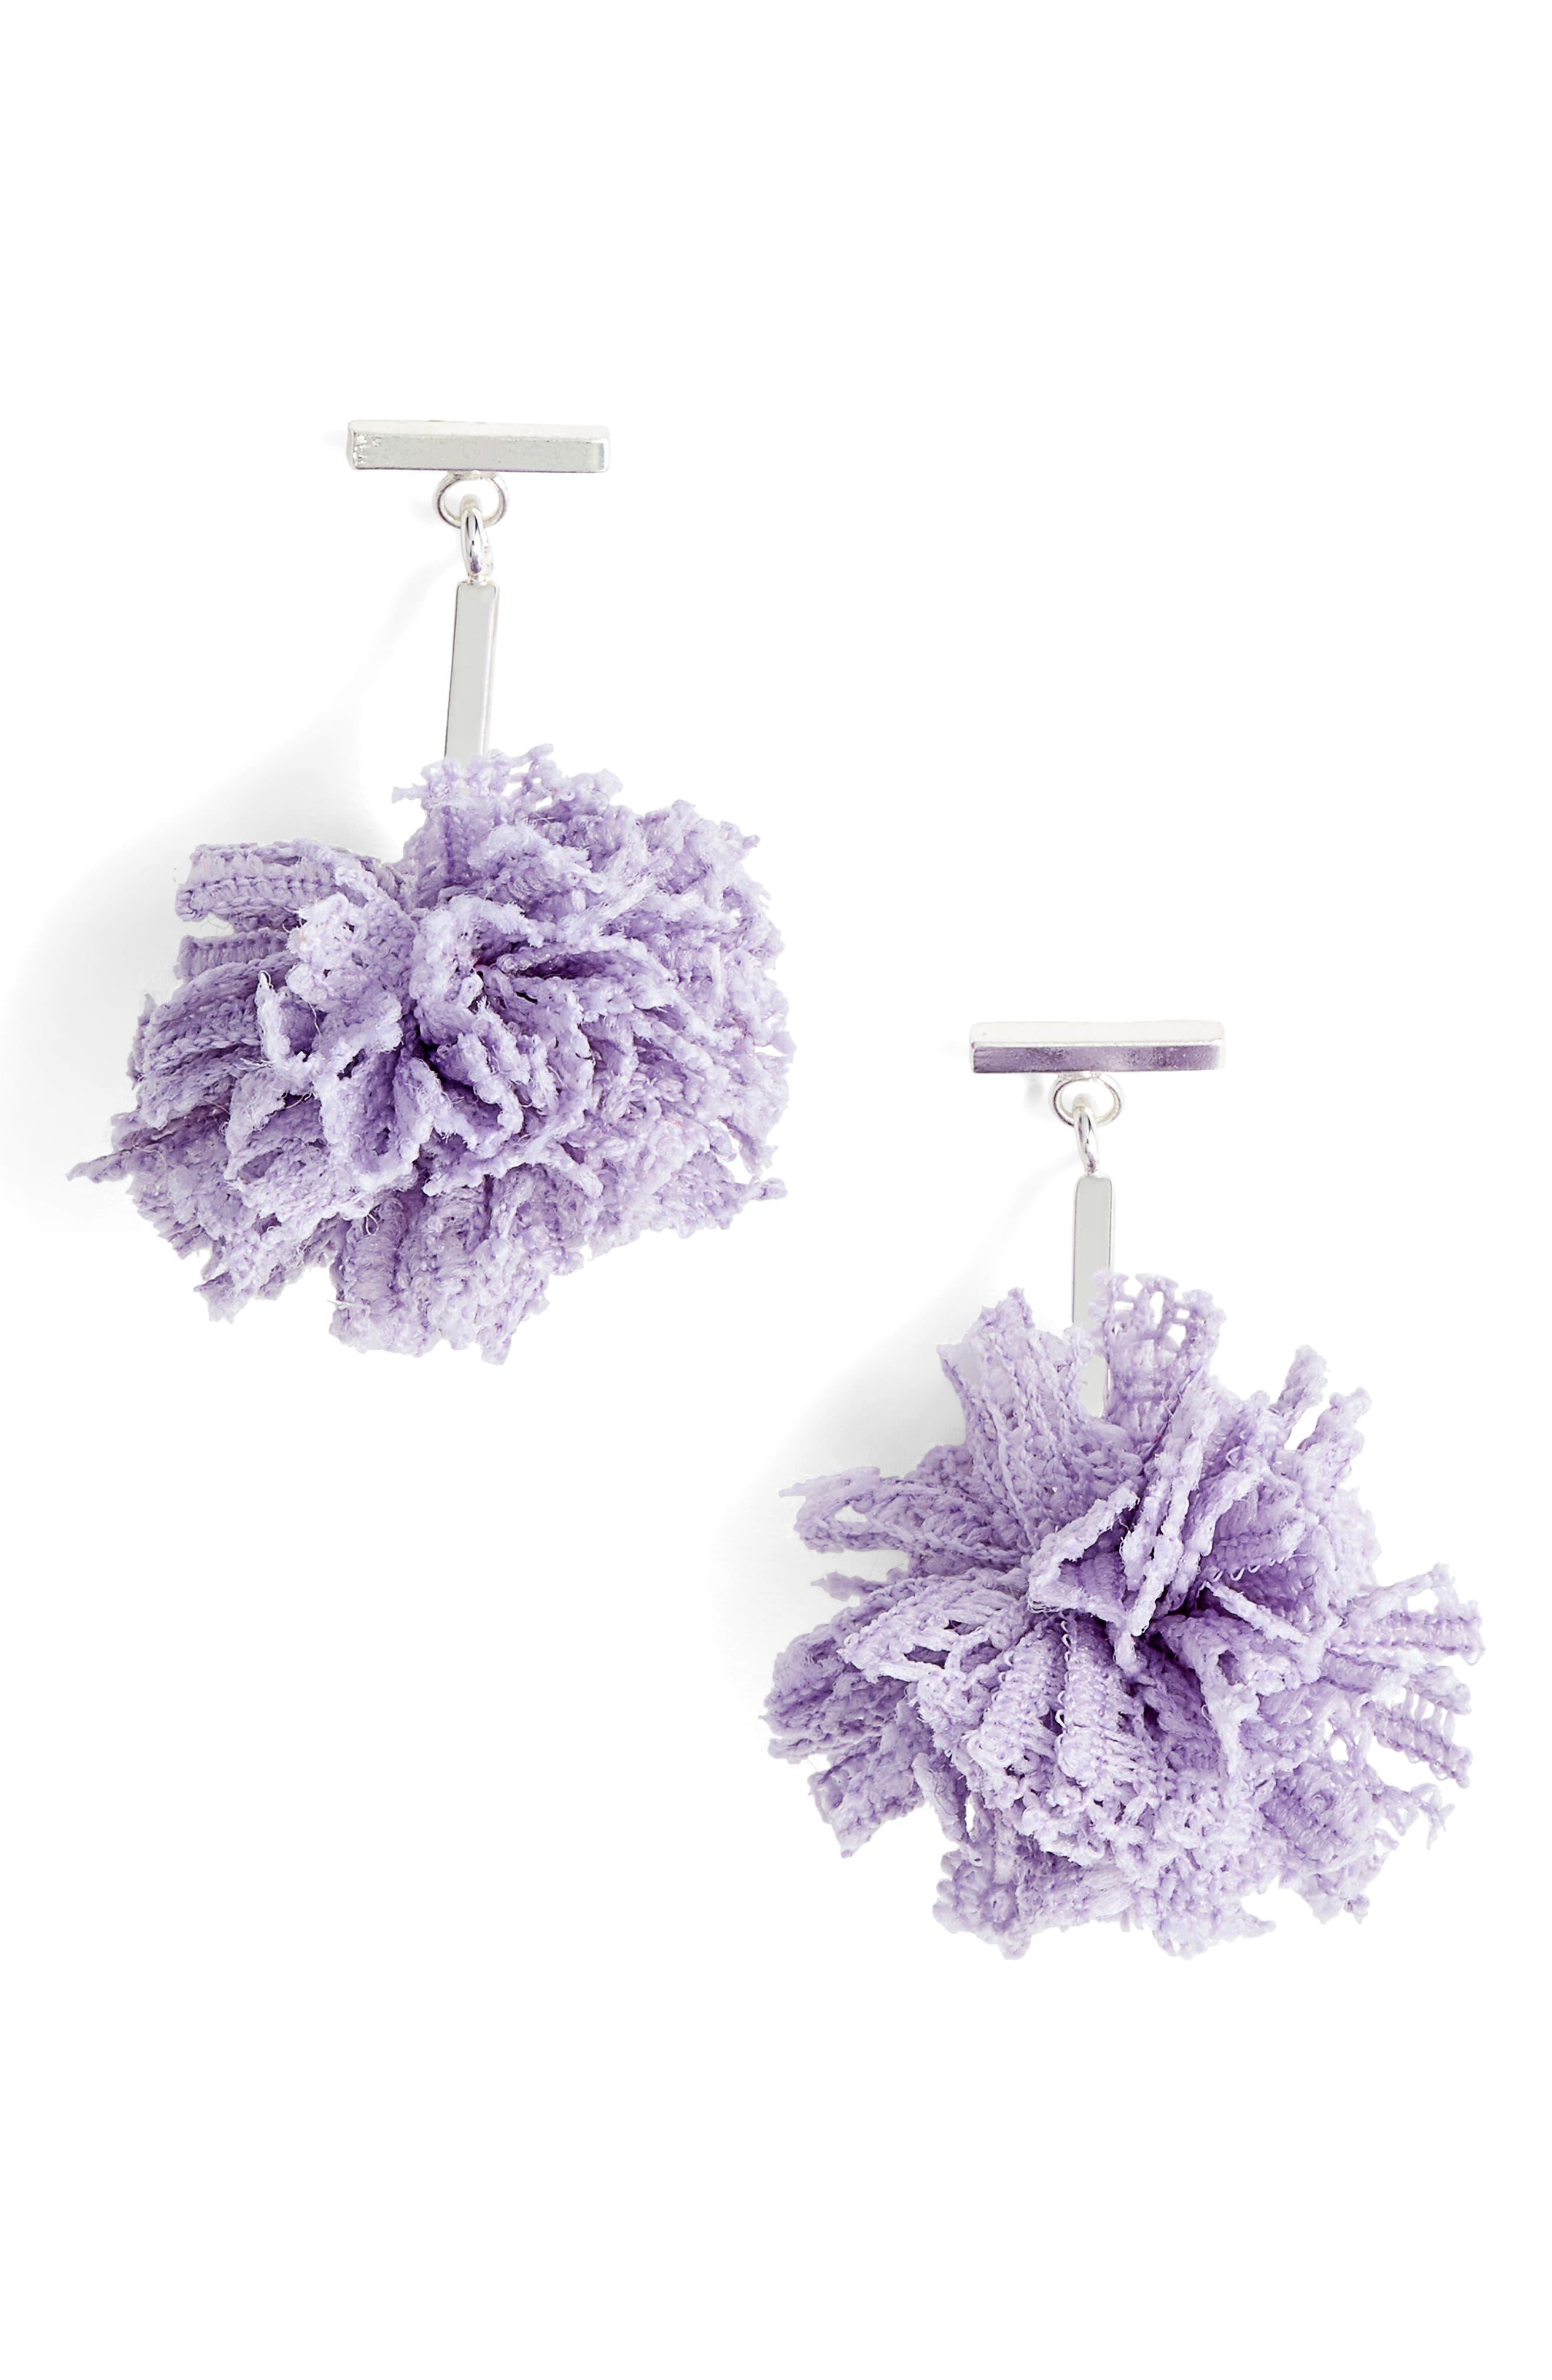 Lace Pom Pom T-Bar Stud Earrings,                             Main thumbnail 1, color,                             Silver/ Lavender